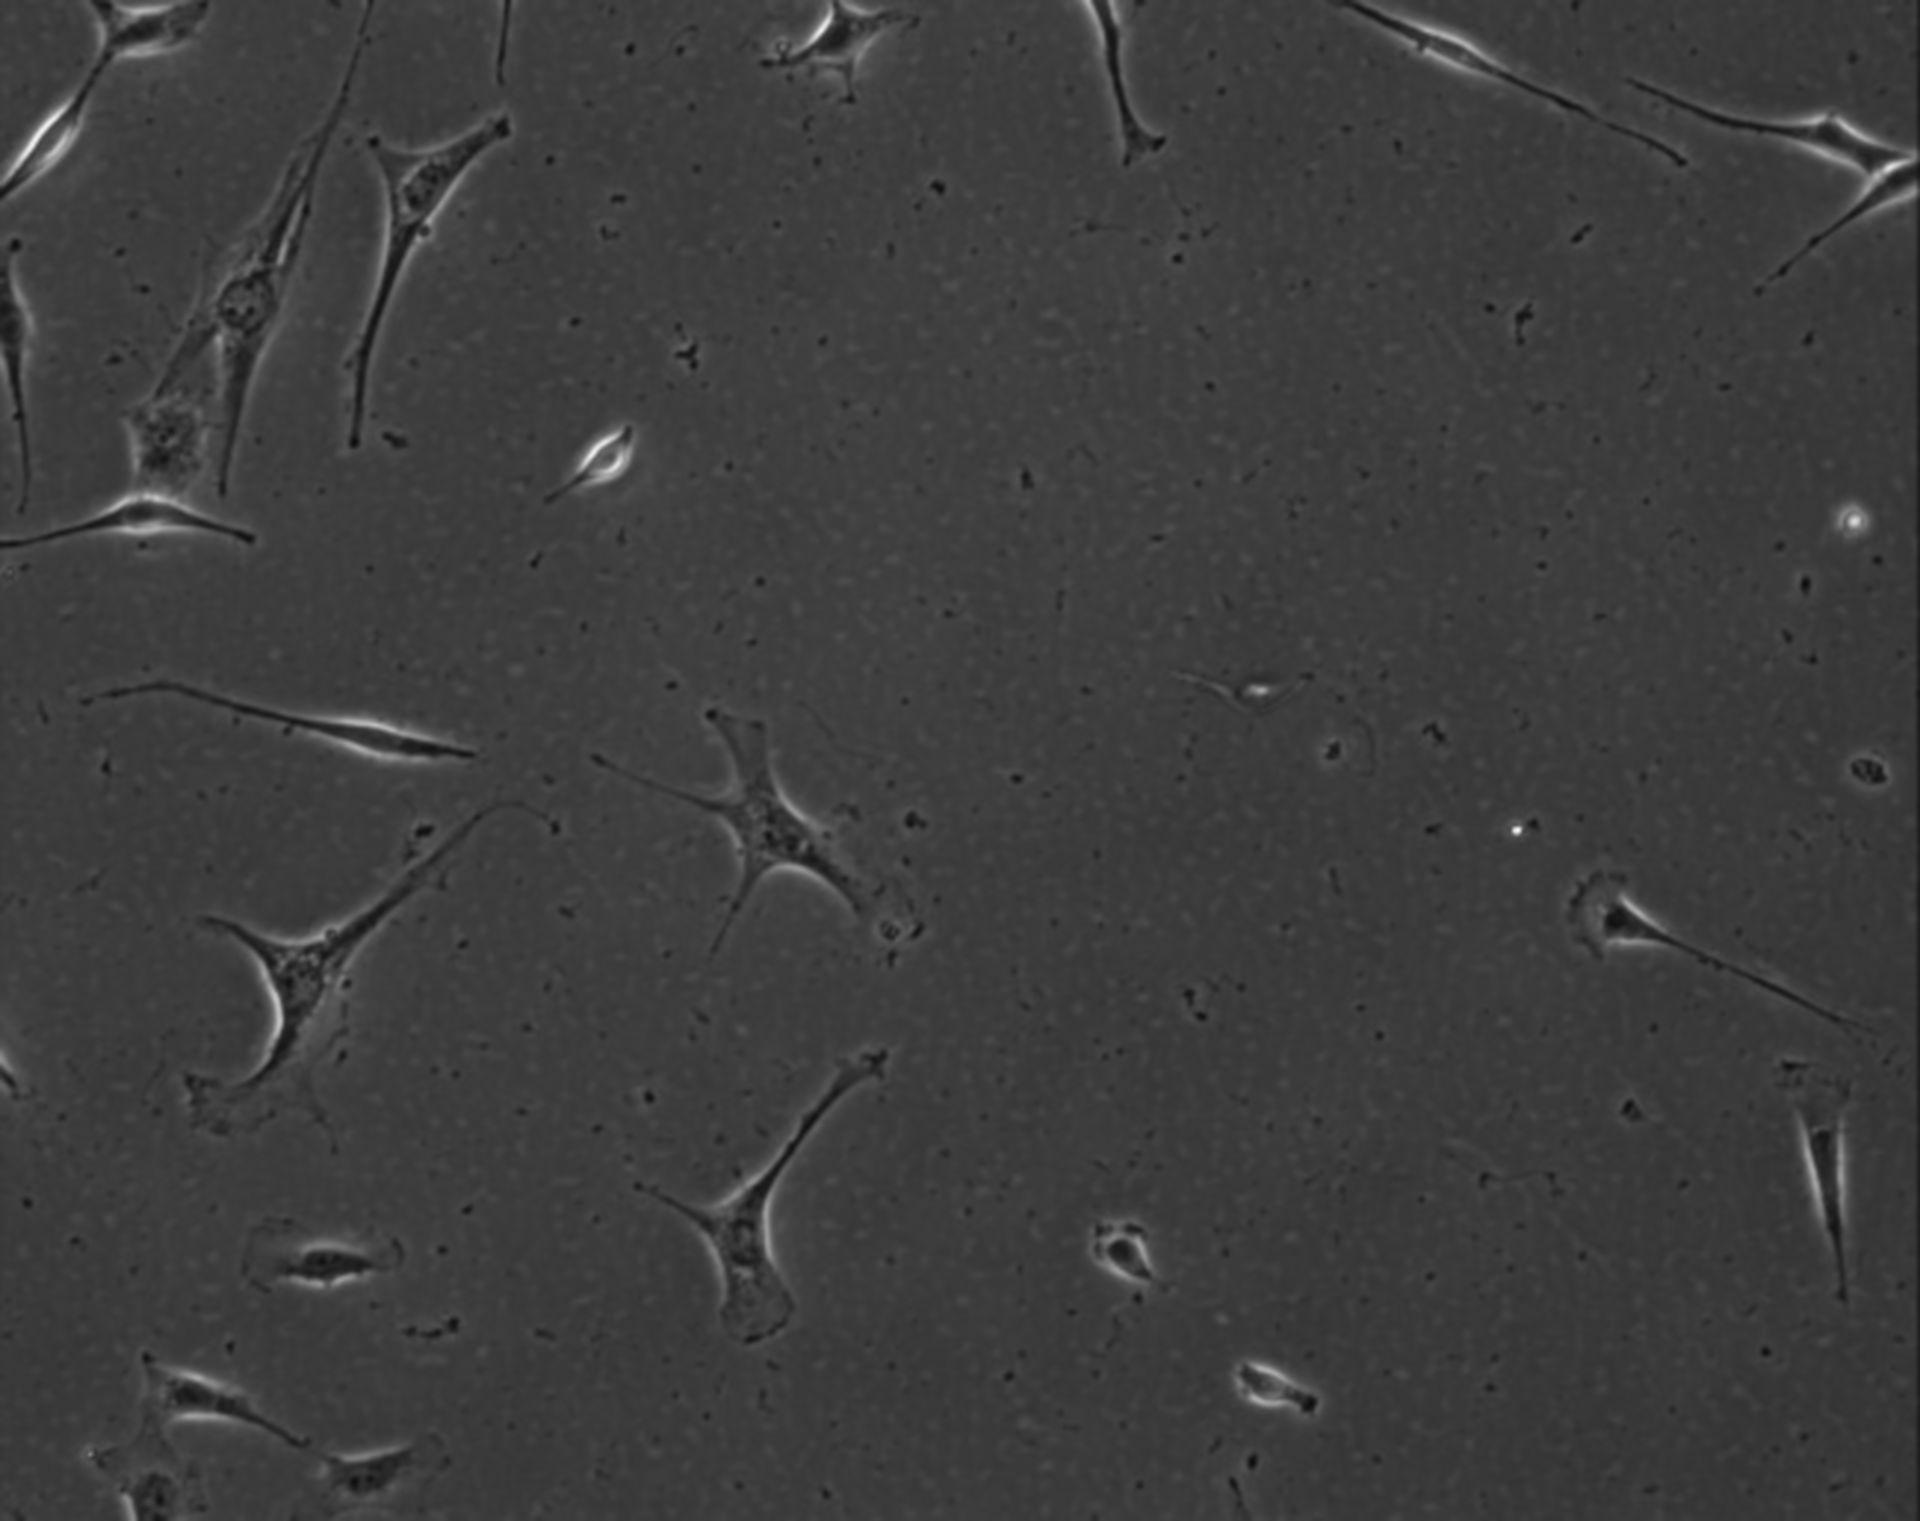 Mus musculus (Extracellular matrix part) - CIL:8997